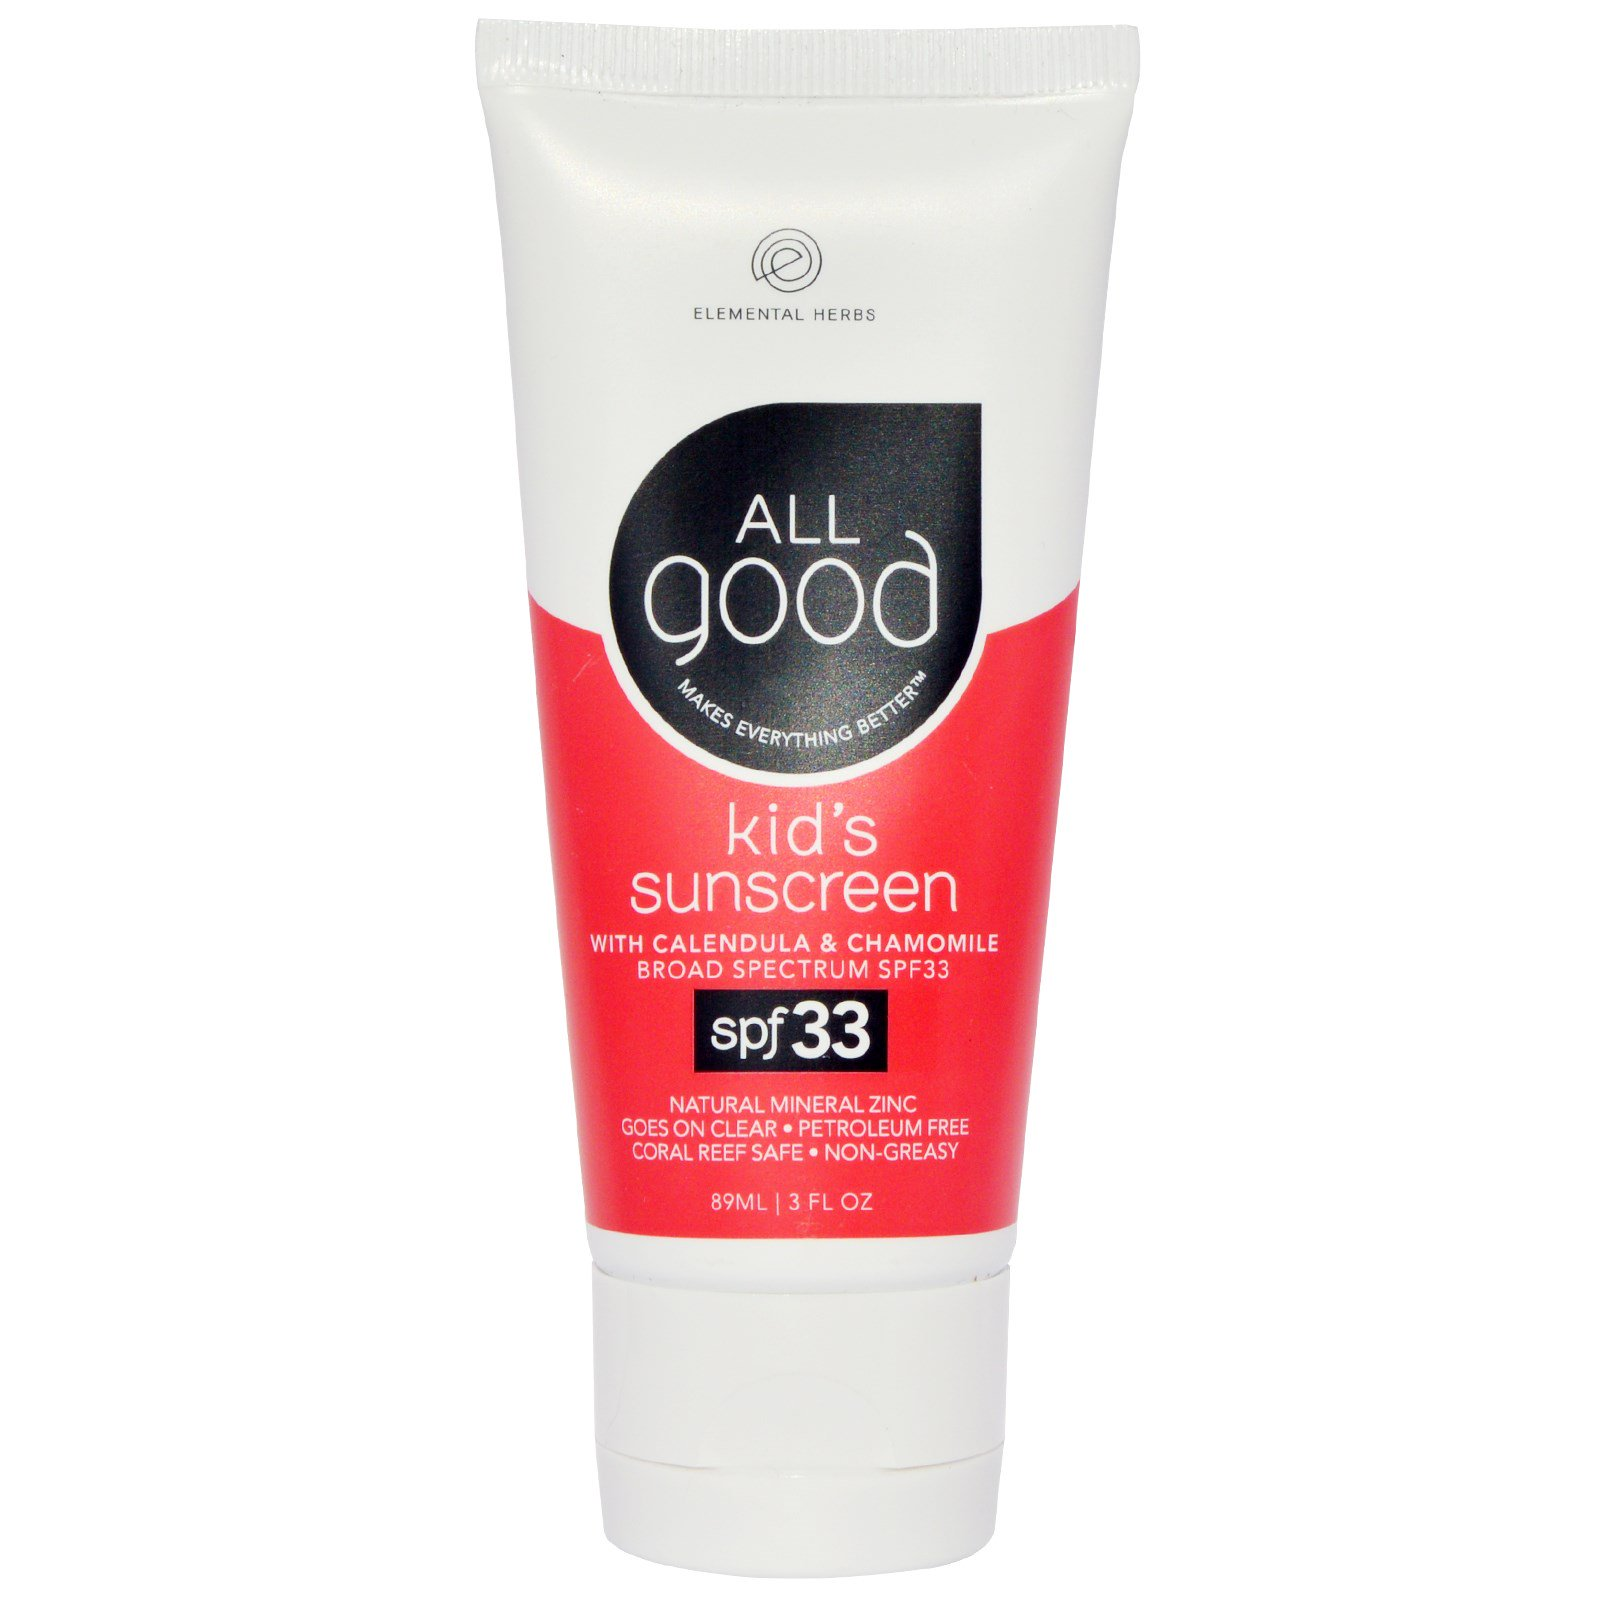 All Good Products, Солнцезащитное средство для детей, SPF 33, 3 жидких унции (89 мл)